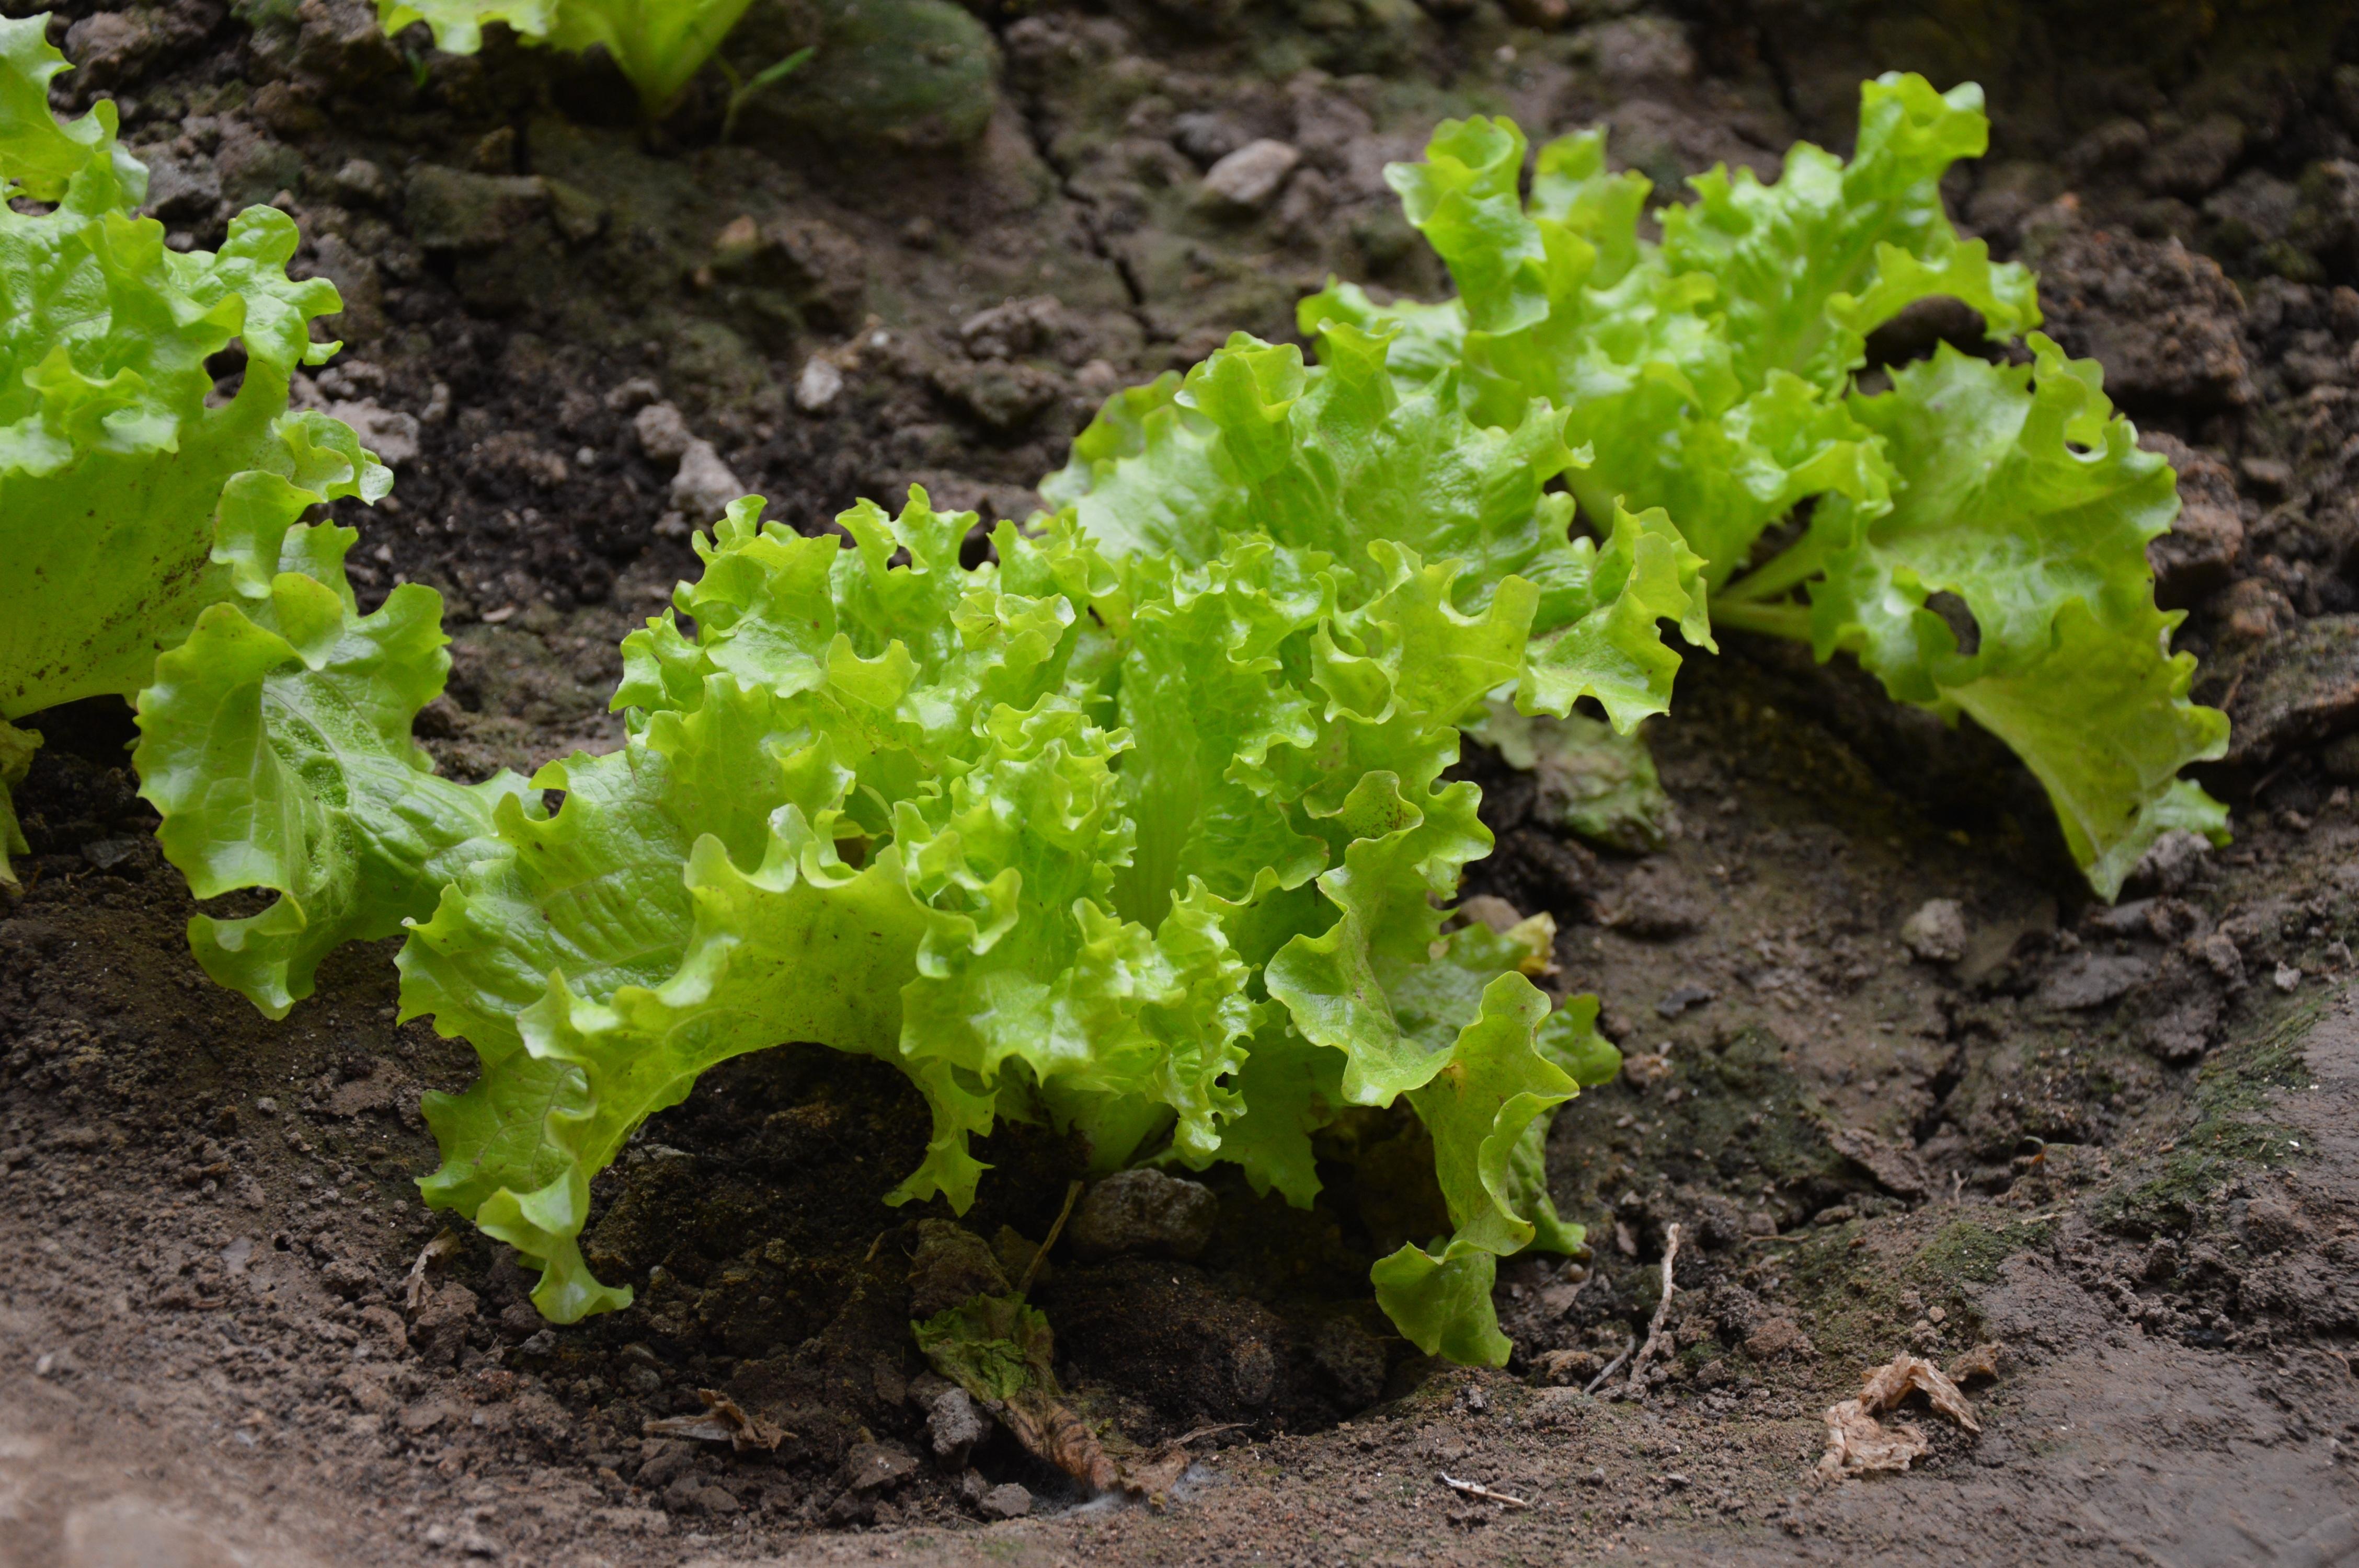 Free Images farm food produce soil garden lettuce vegetables